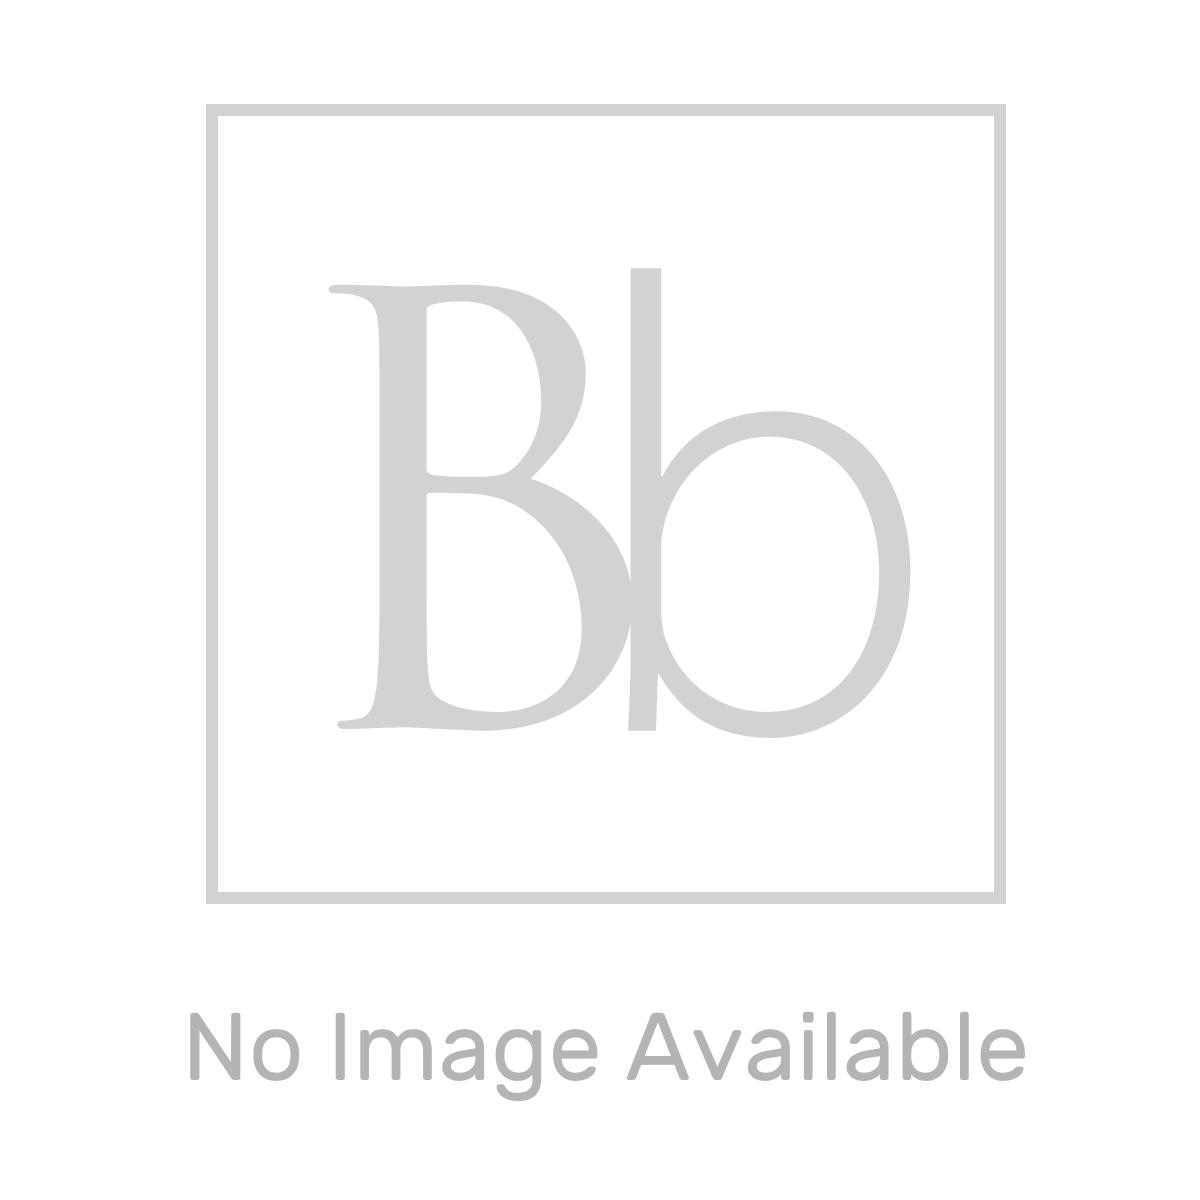 Aquadart Black Slate Shower Tray 1500 x 700